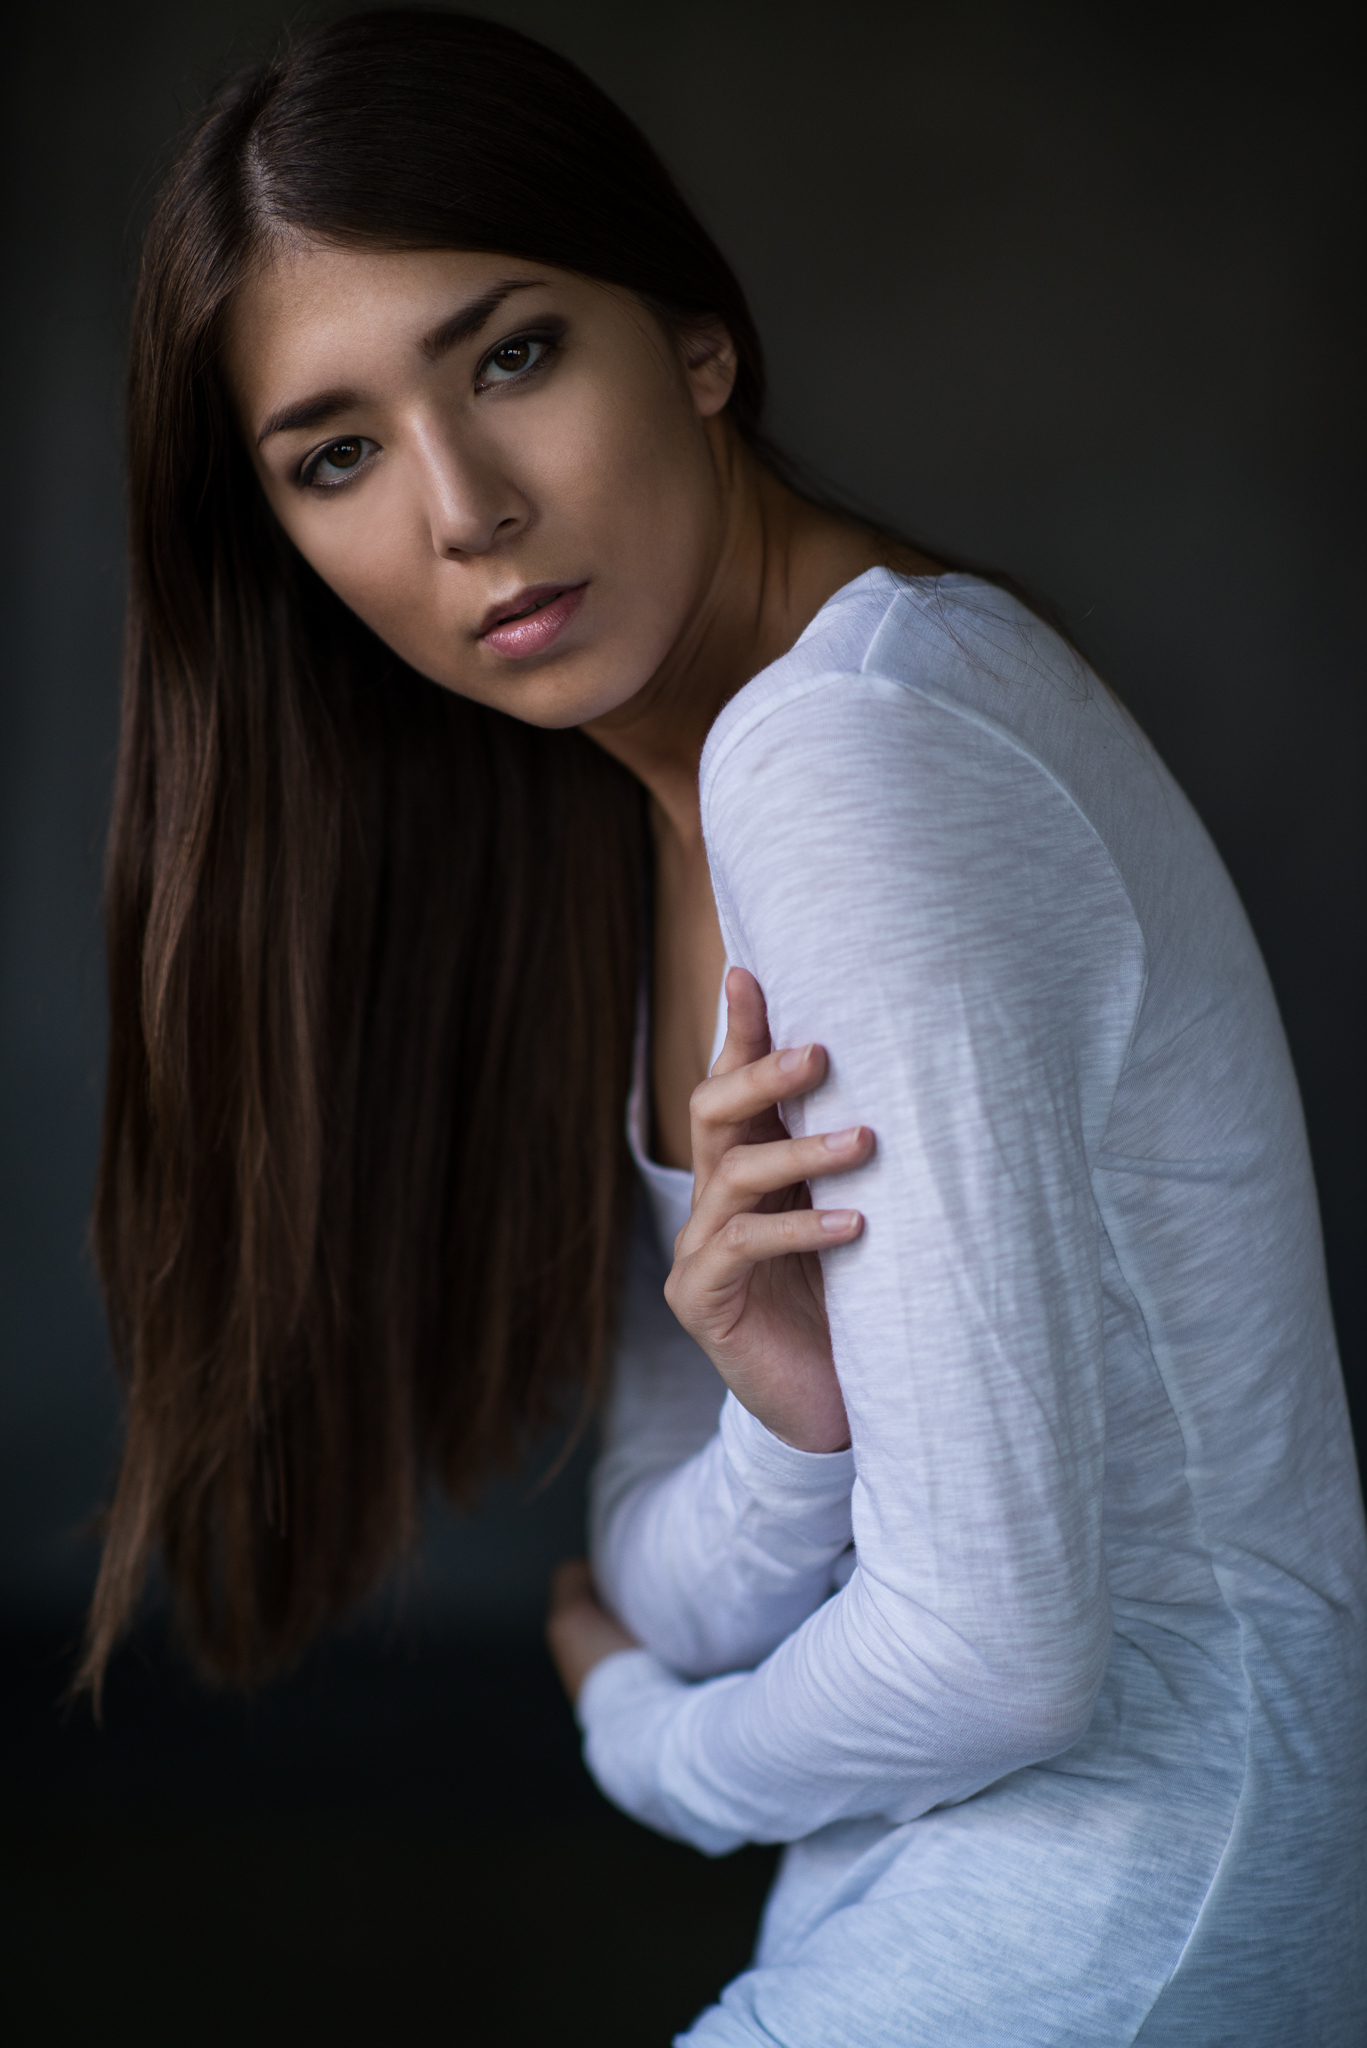 Christine adams topless, girl sucks off shemale